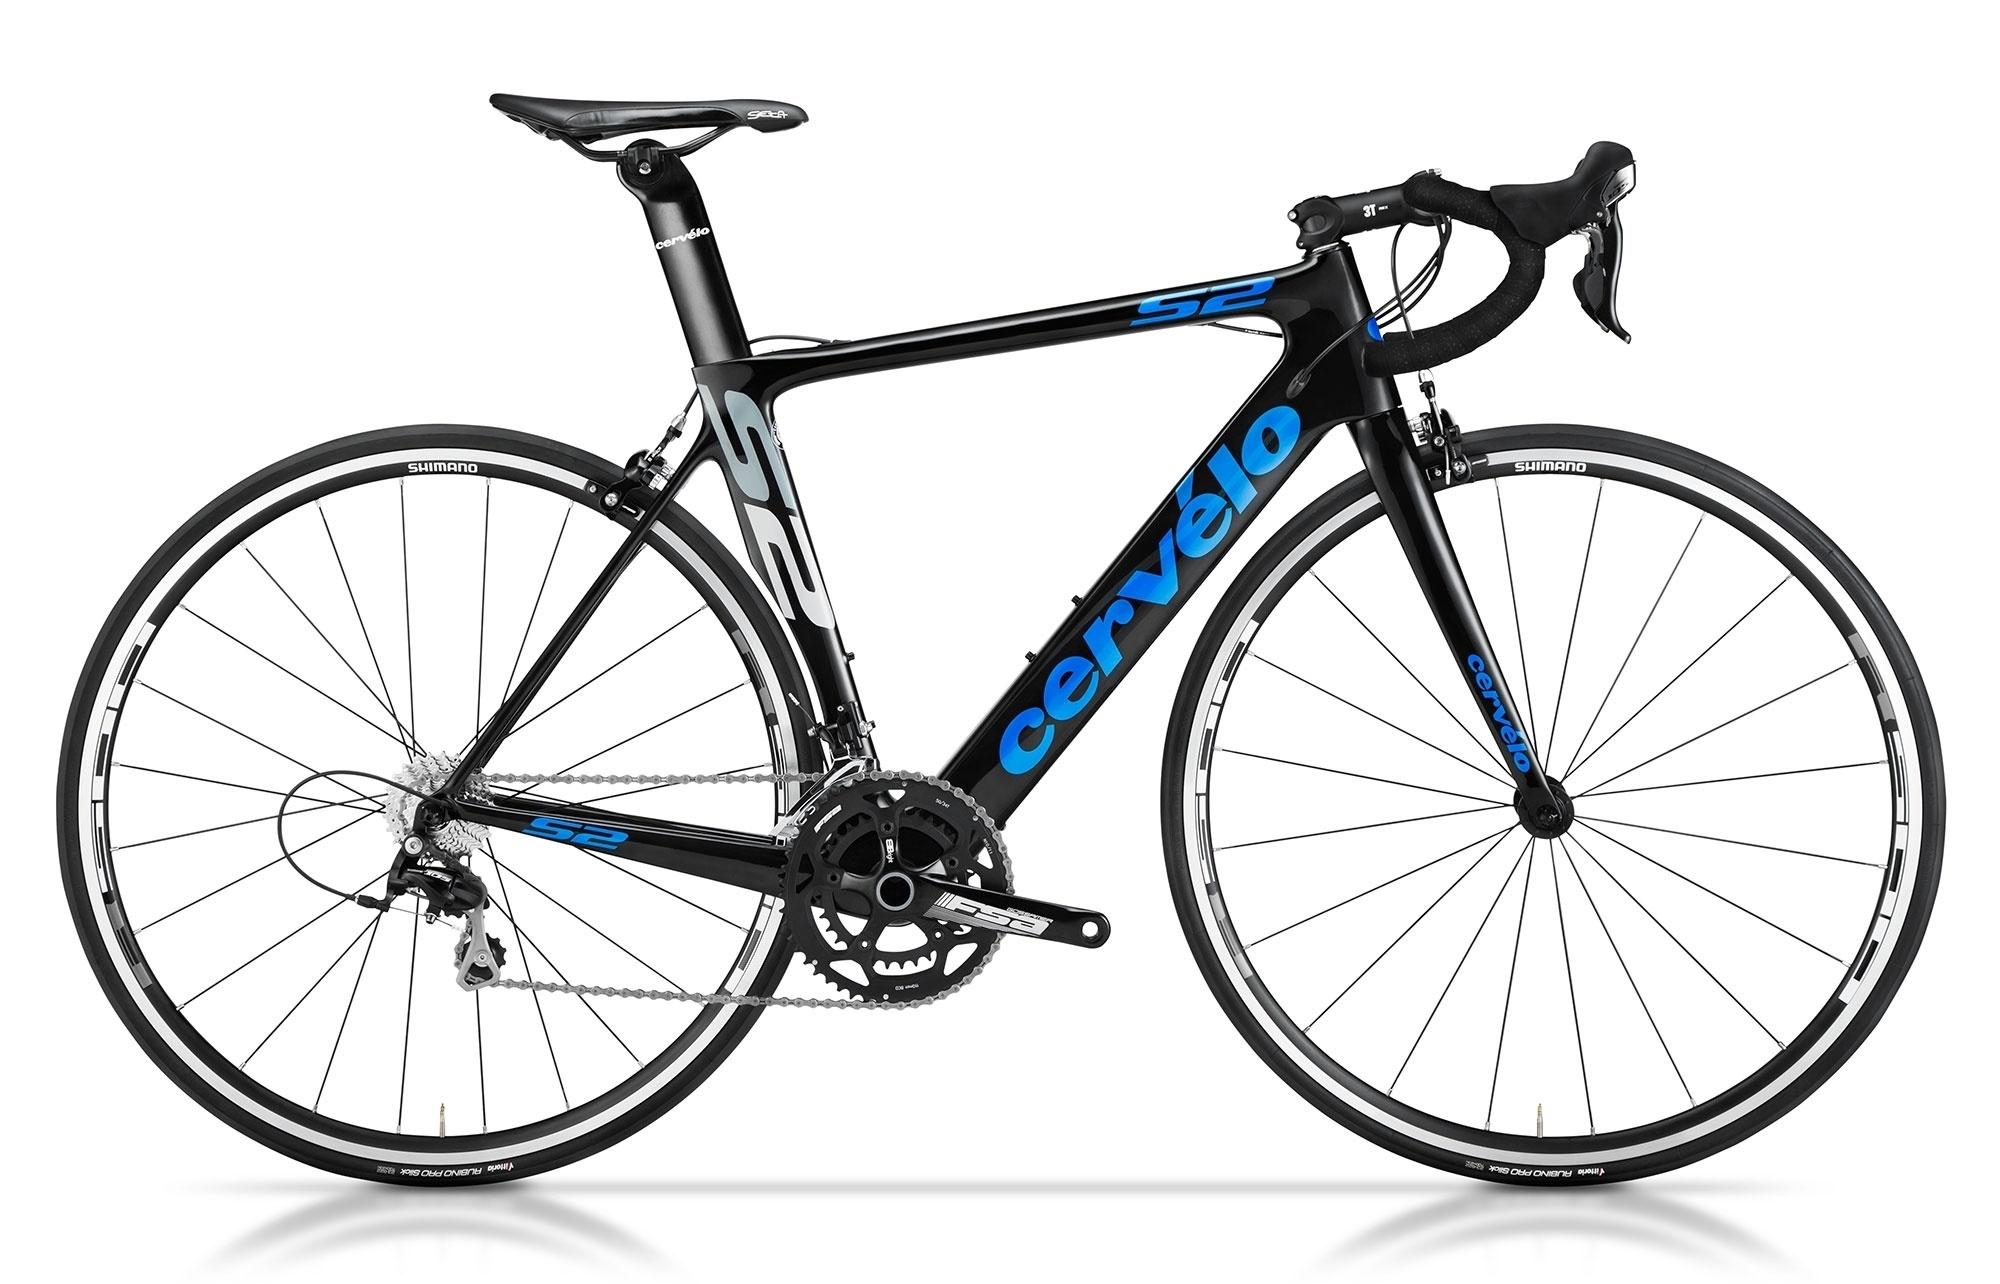 0f151fb91d2 2014 Cervelo S2 105 Bike   R&A Cycles